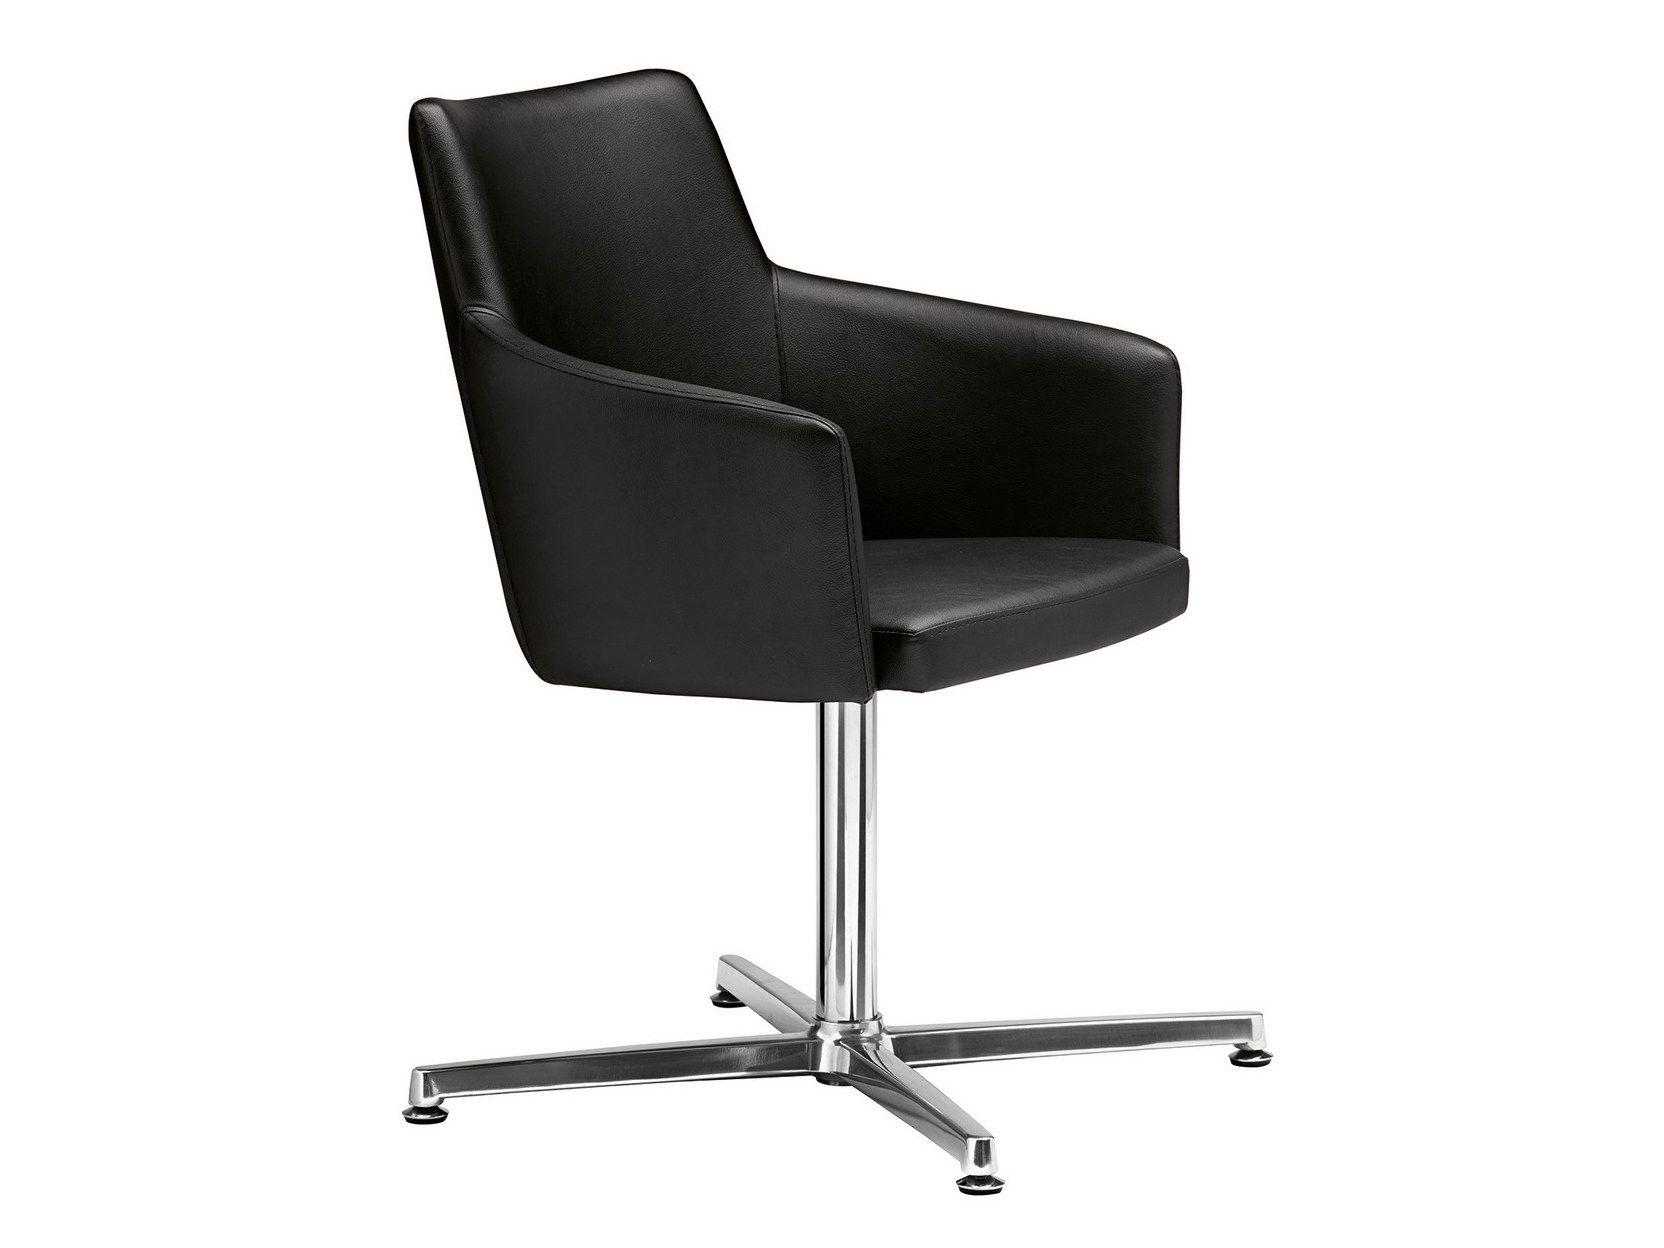 Marka 569 n by metalmobil design carlo bimbi for Metallmobel design